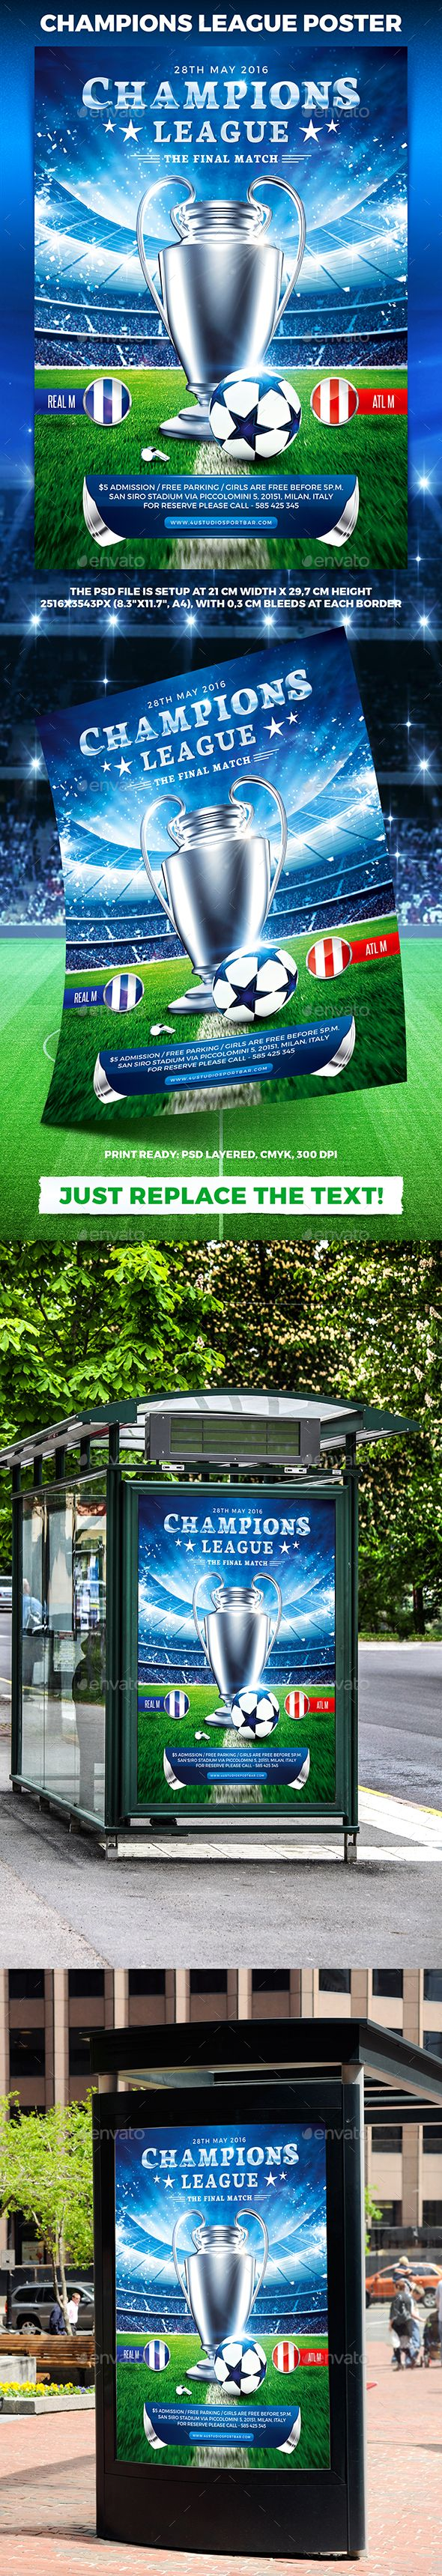 Google chrome themes crvena zvezda - Download Free Graphicriver Football Champions League Poster Vol 2 4ustudio Ball Championsleague